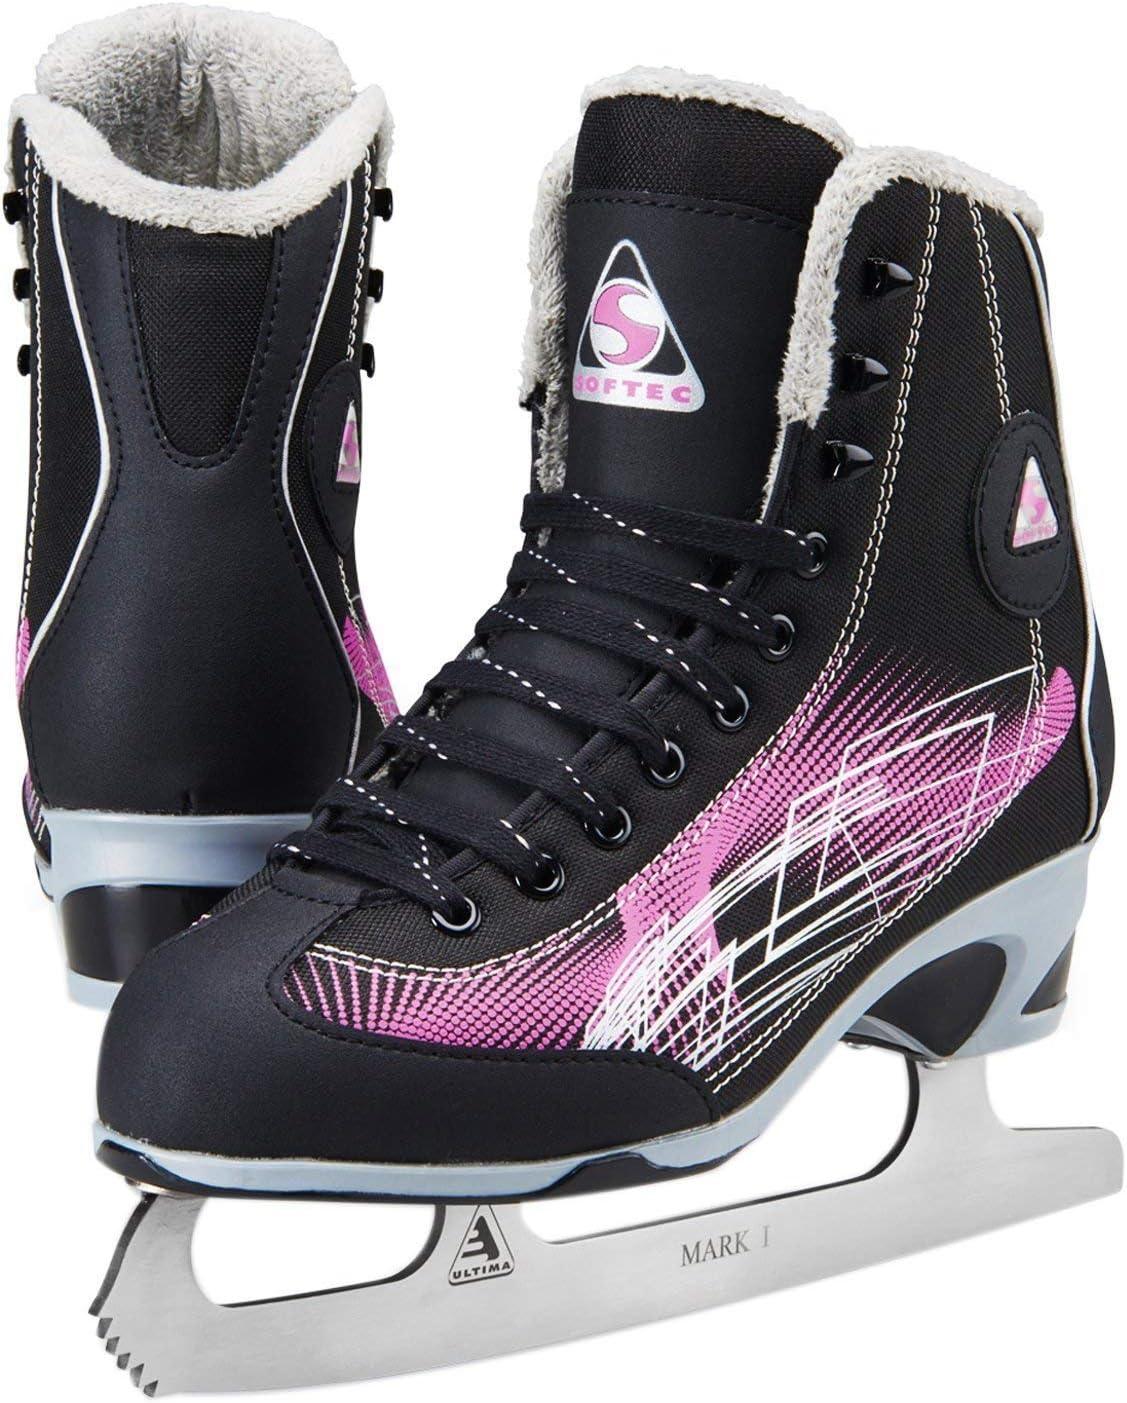 Jackson Ultima Figure Skates - Rave レディース RV2000 パープル 幅 ミディアム  Adult Medium 6